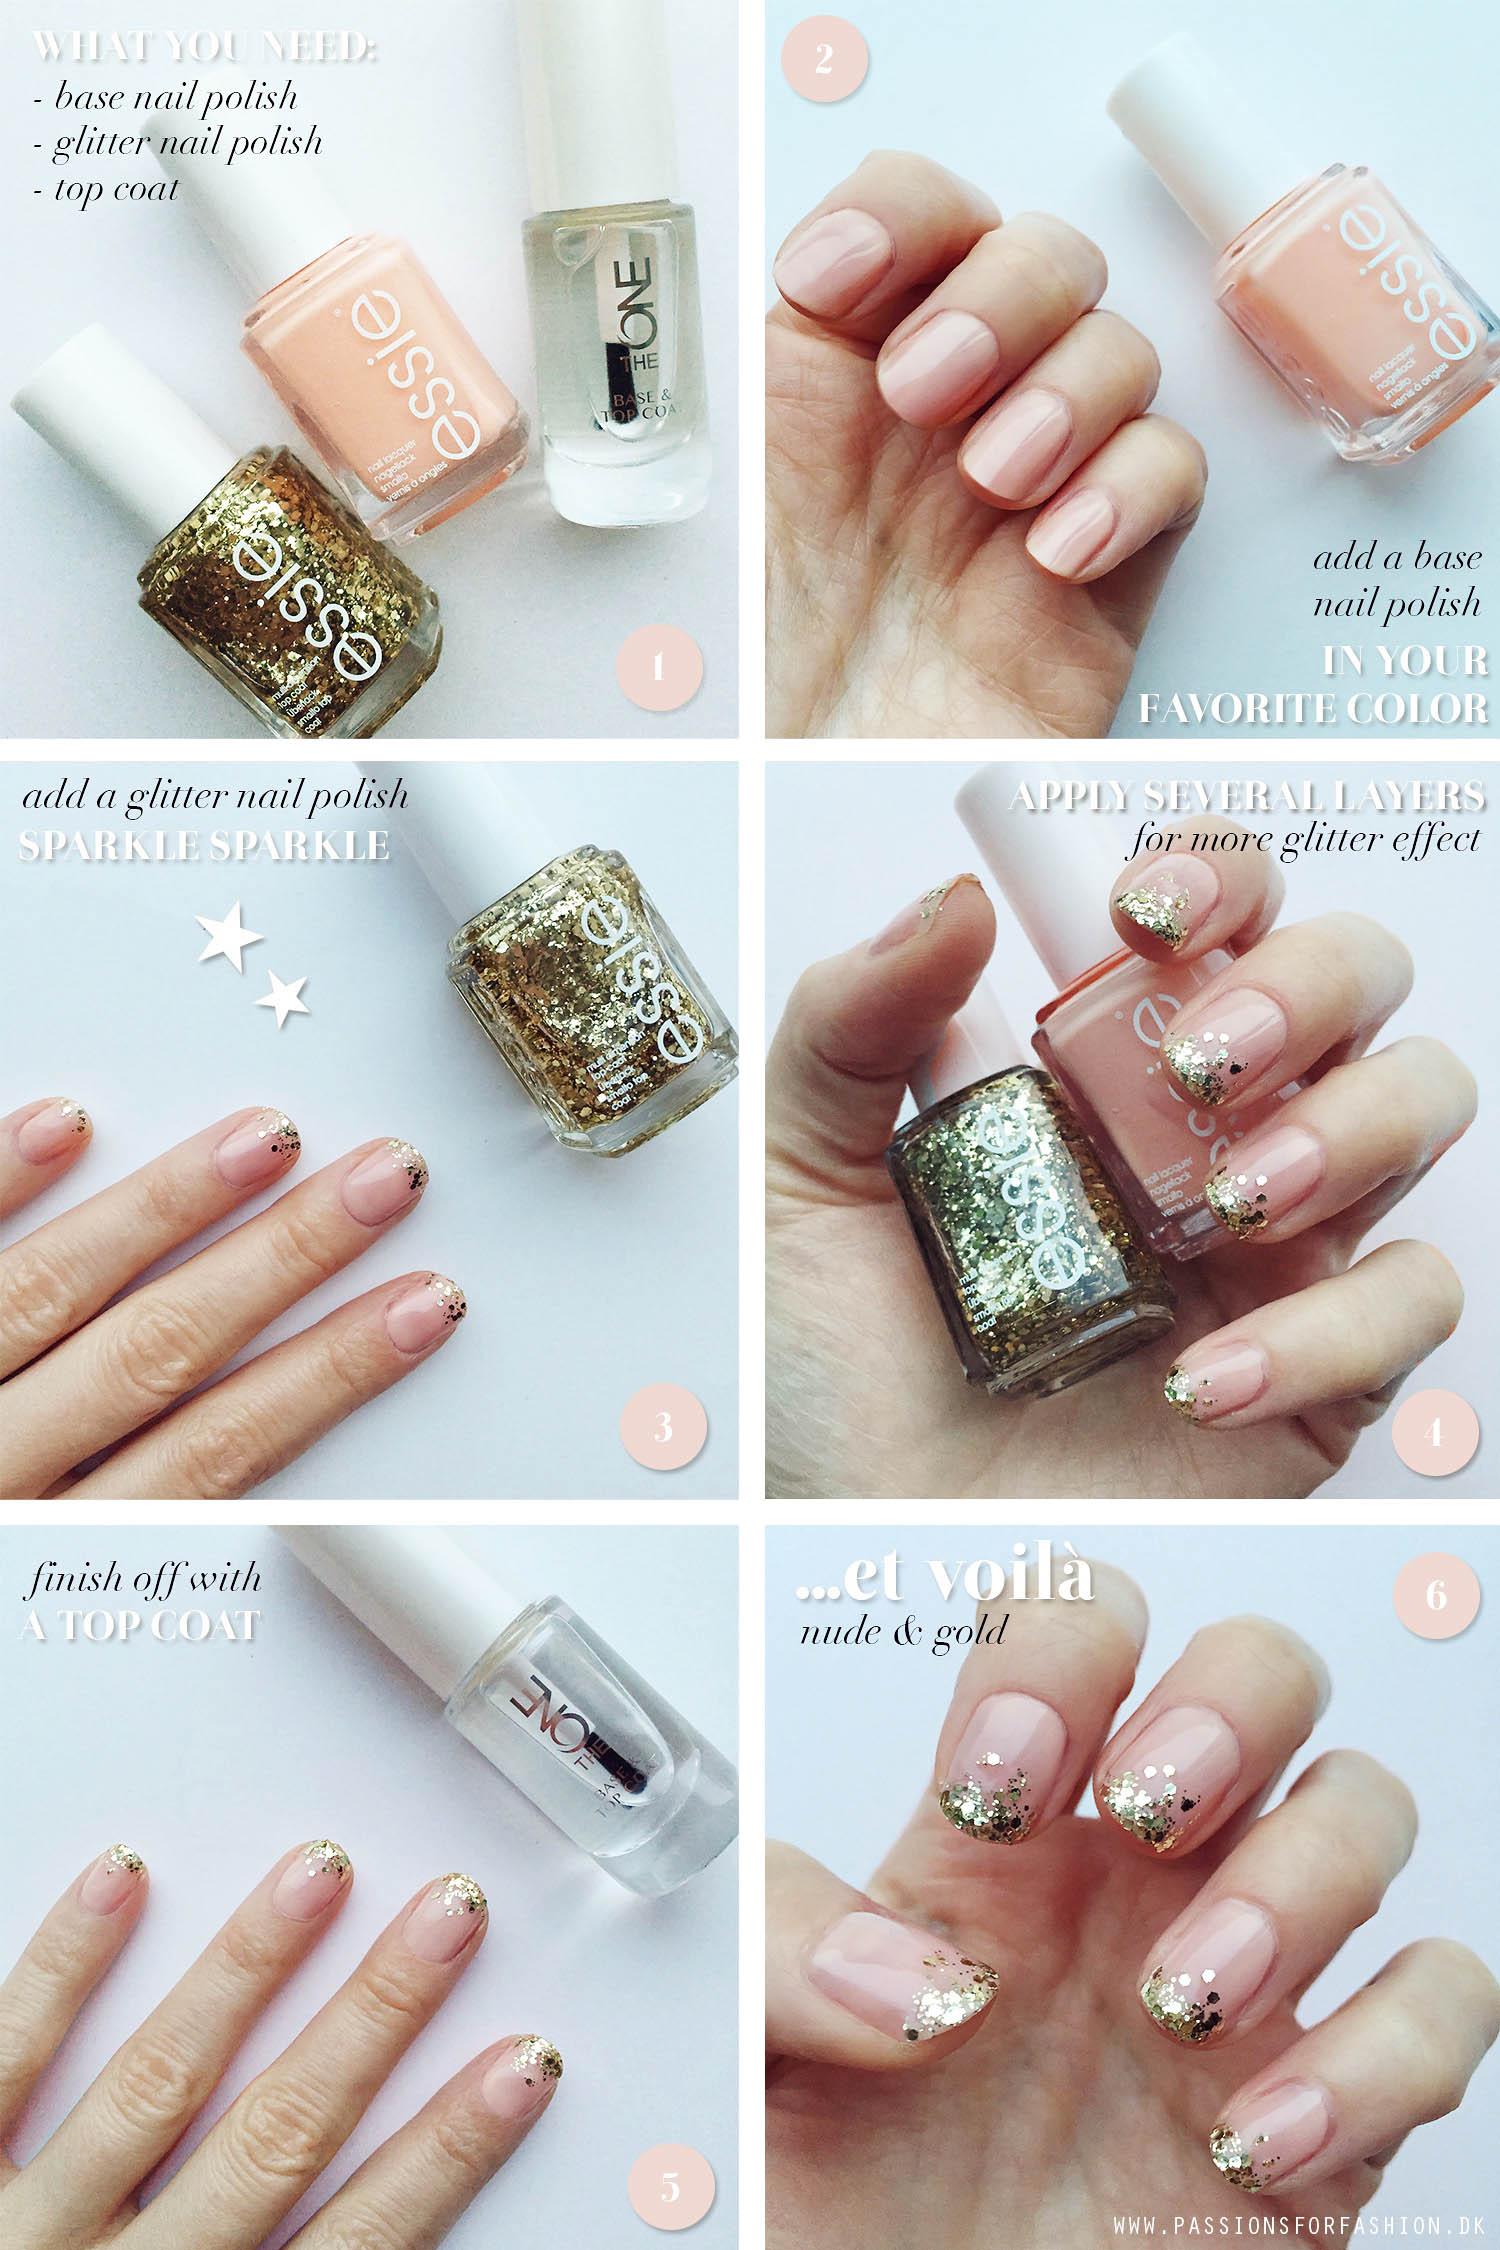 DIY nail art@2x